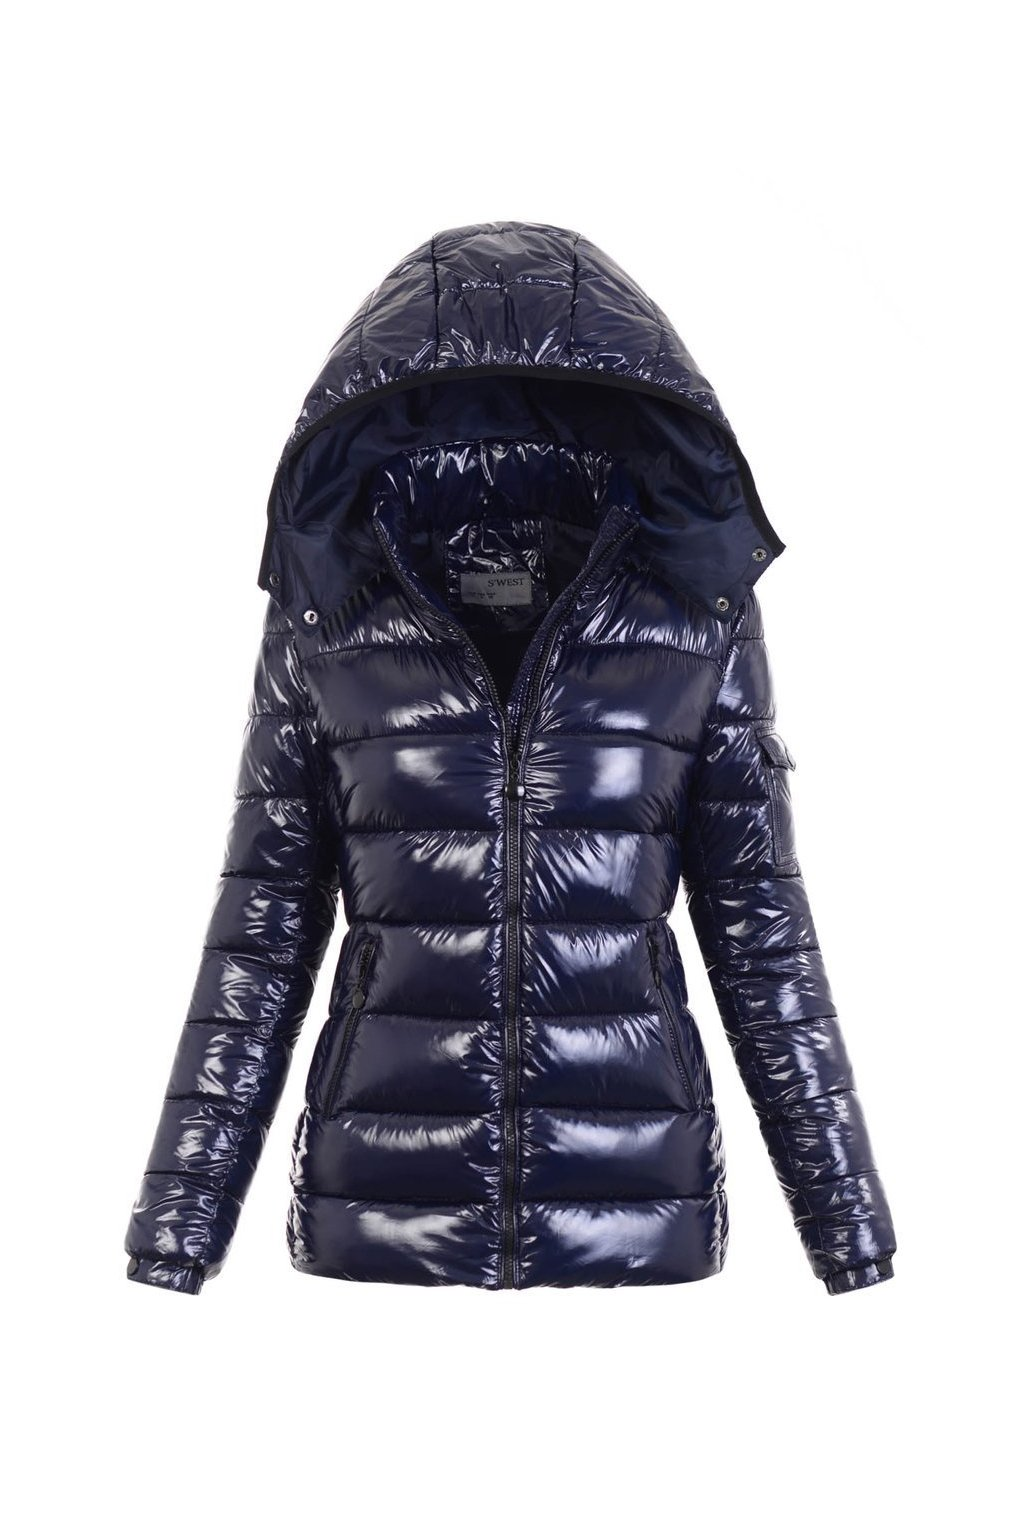 Dámska zimná bunda s kapucňou 5998 modrá